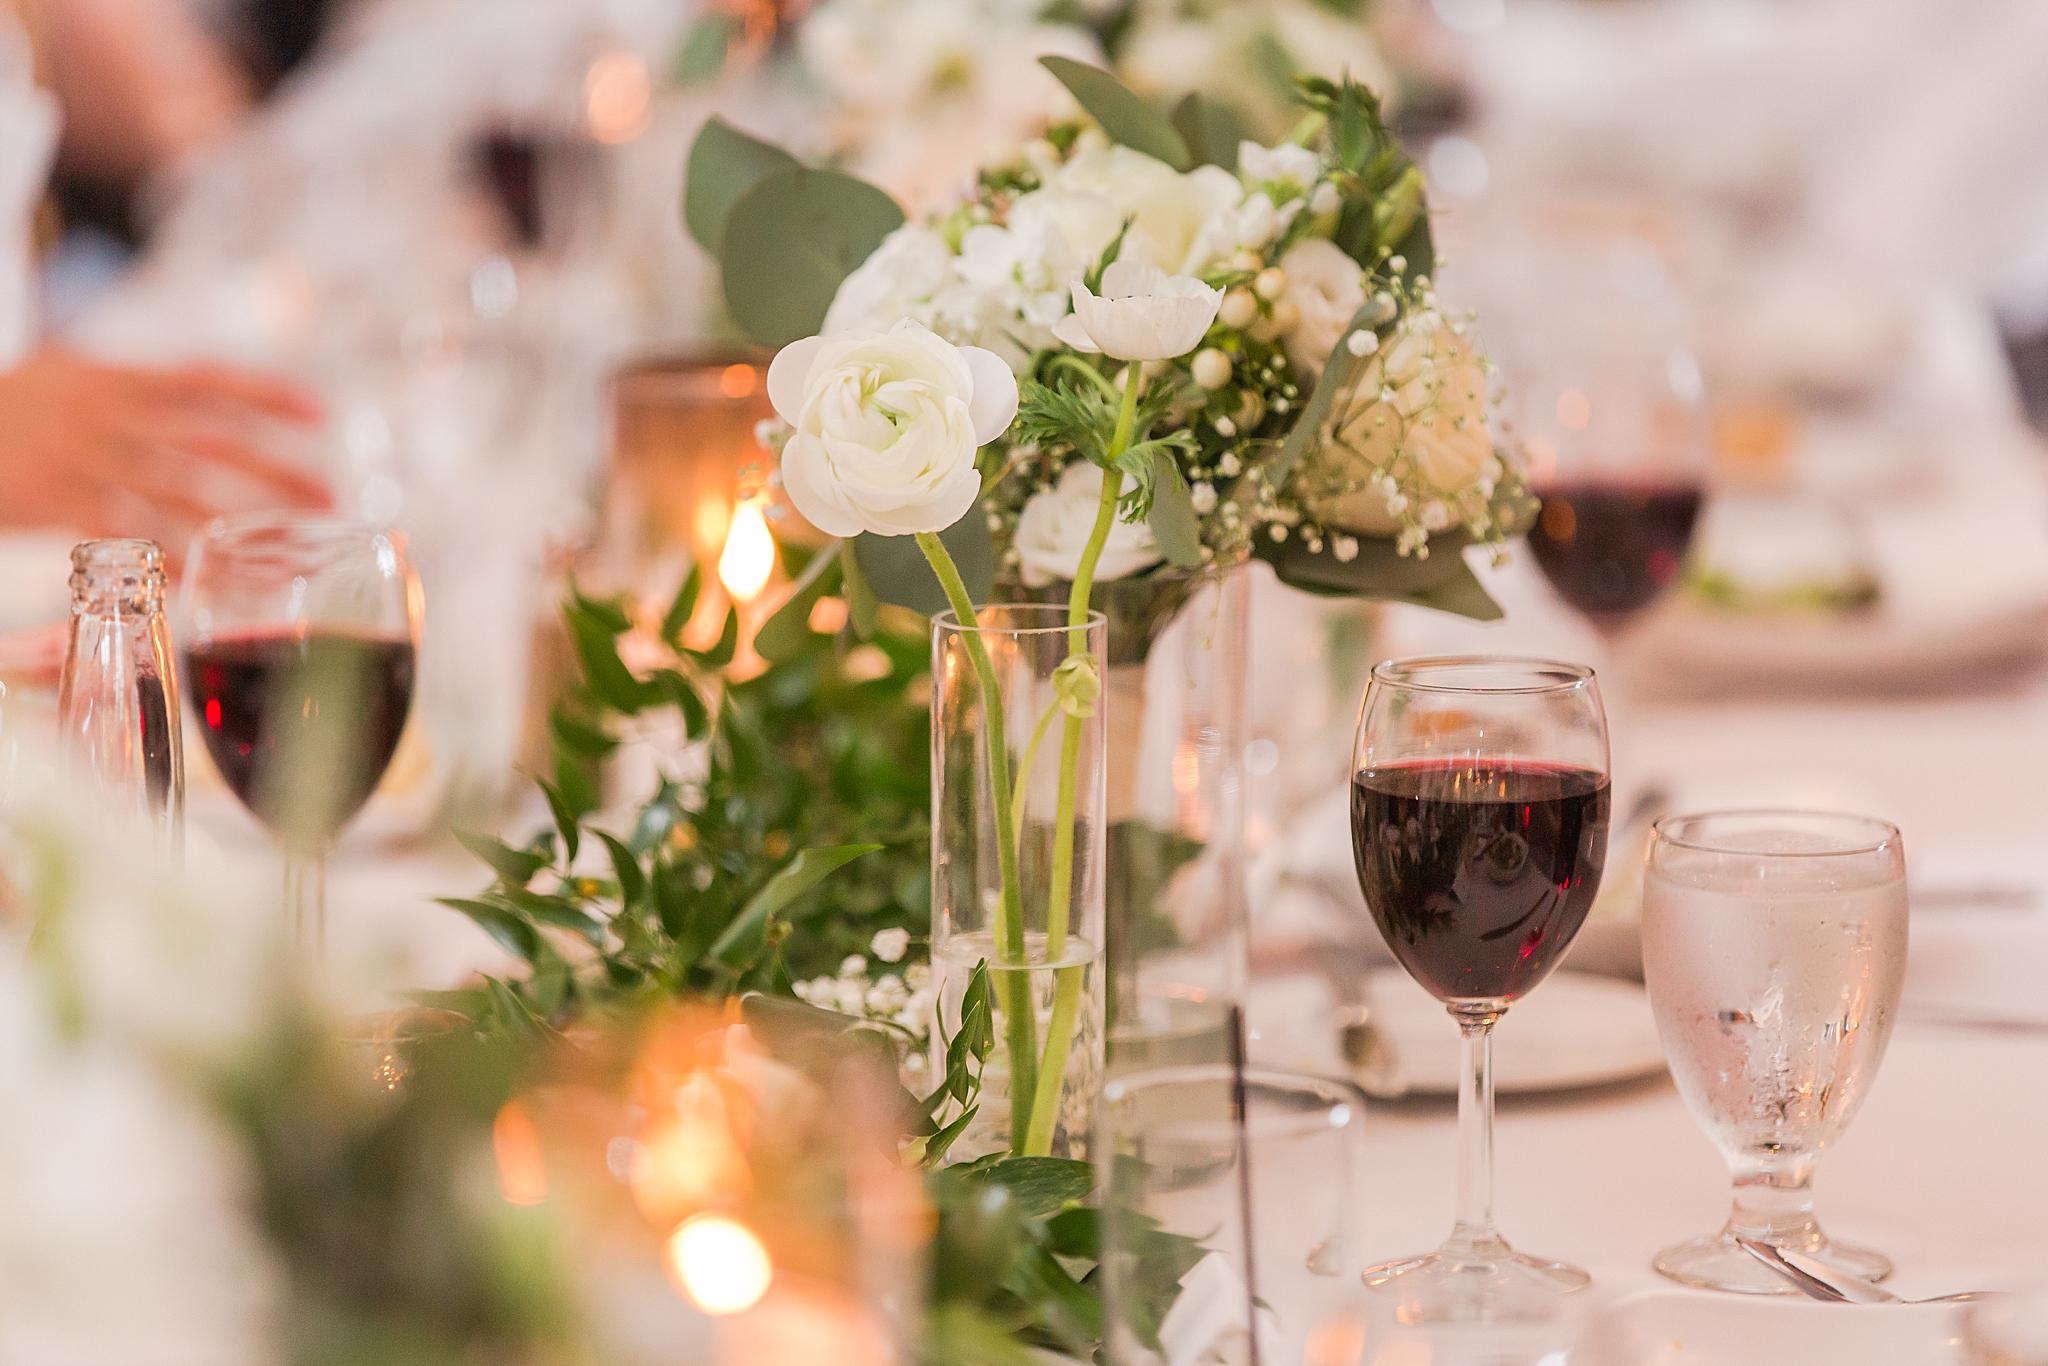 detroit-wedding-photographer-grosse-pointe-academy-chapel-detroit-golf-club-wedding-carly-matt-by-courtney-carolyn-photography_0094.jpg